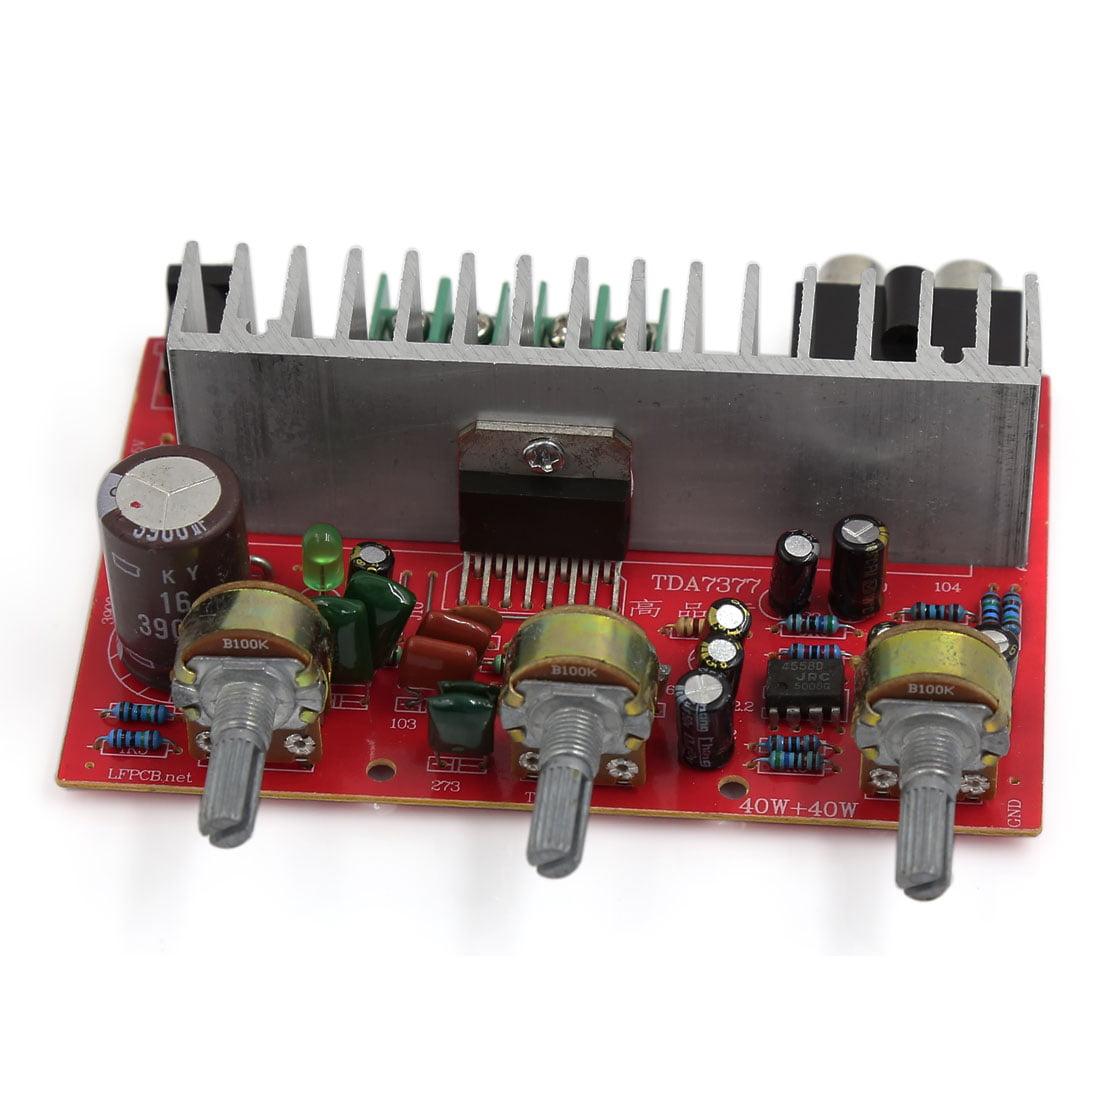 Unique Bargains 40W+40W LFE Subwoofer Audio Hi-Fi 2 Channel Car Stereo Power Amplifier Board